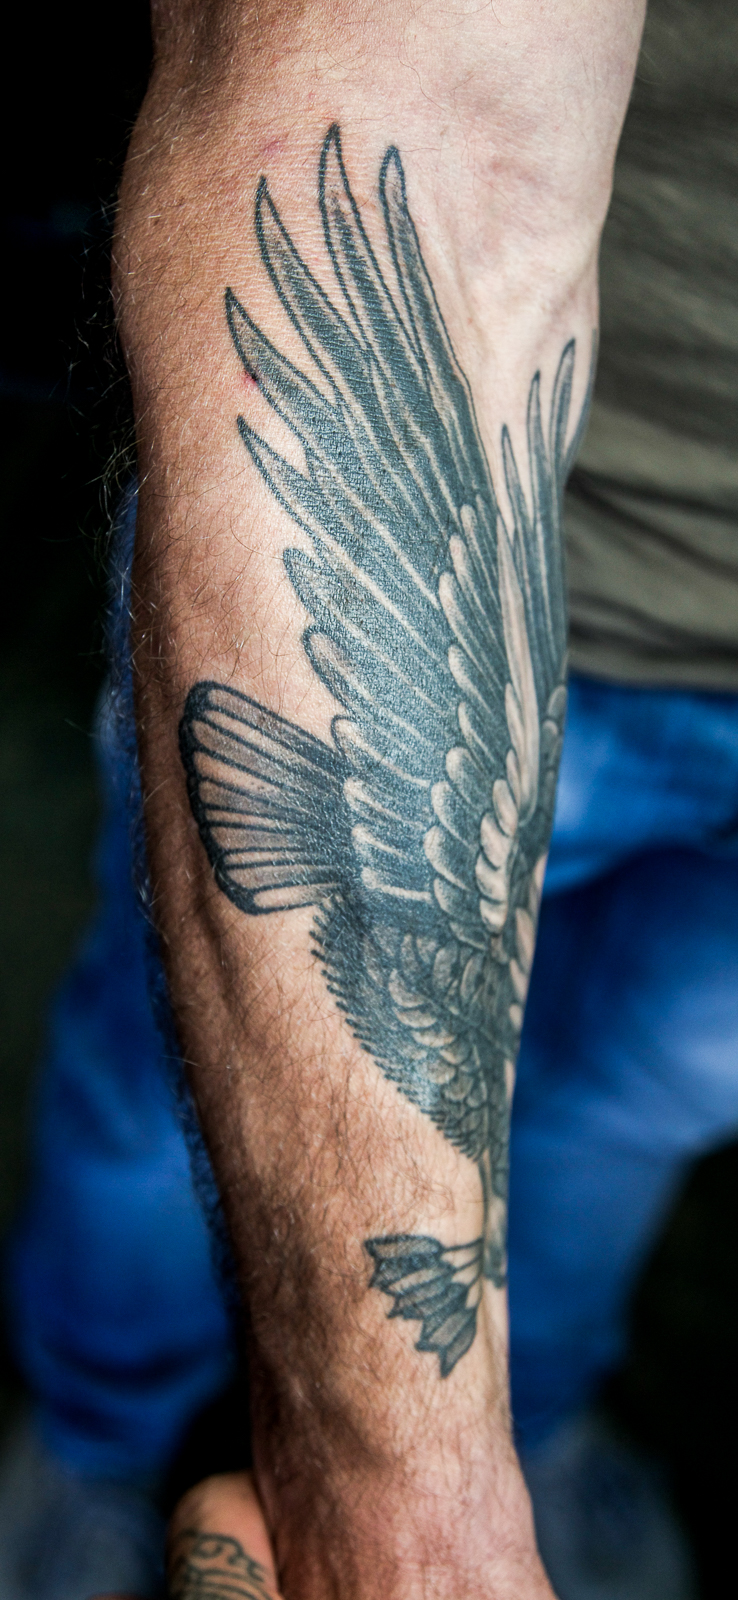 Traditional Eagle 3 enrique bernal ejay tattoo.jpg